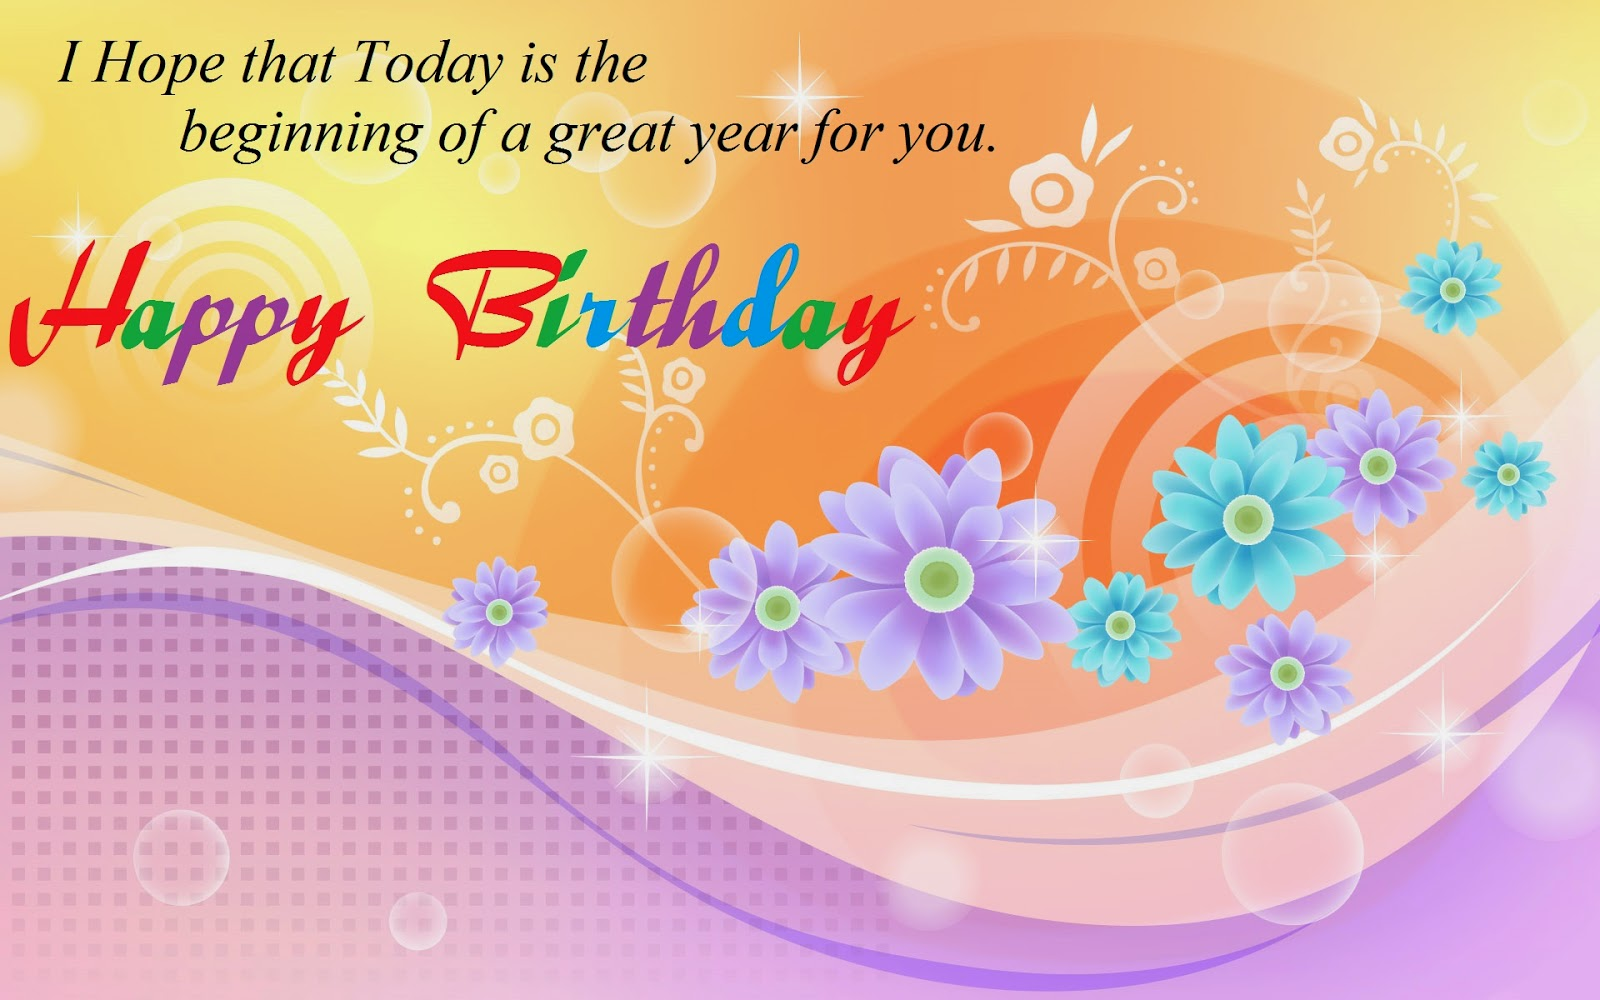 Birthday greetings idealstalist birthday greetings m4hsunfo